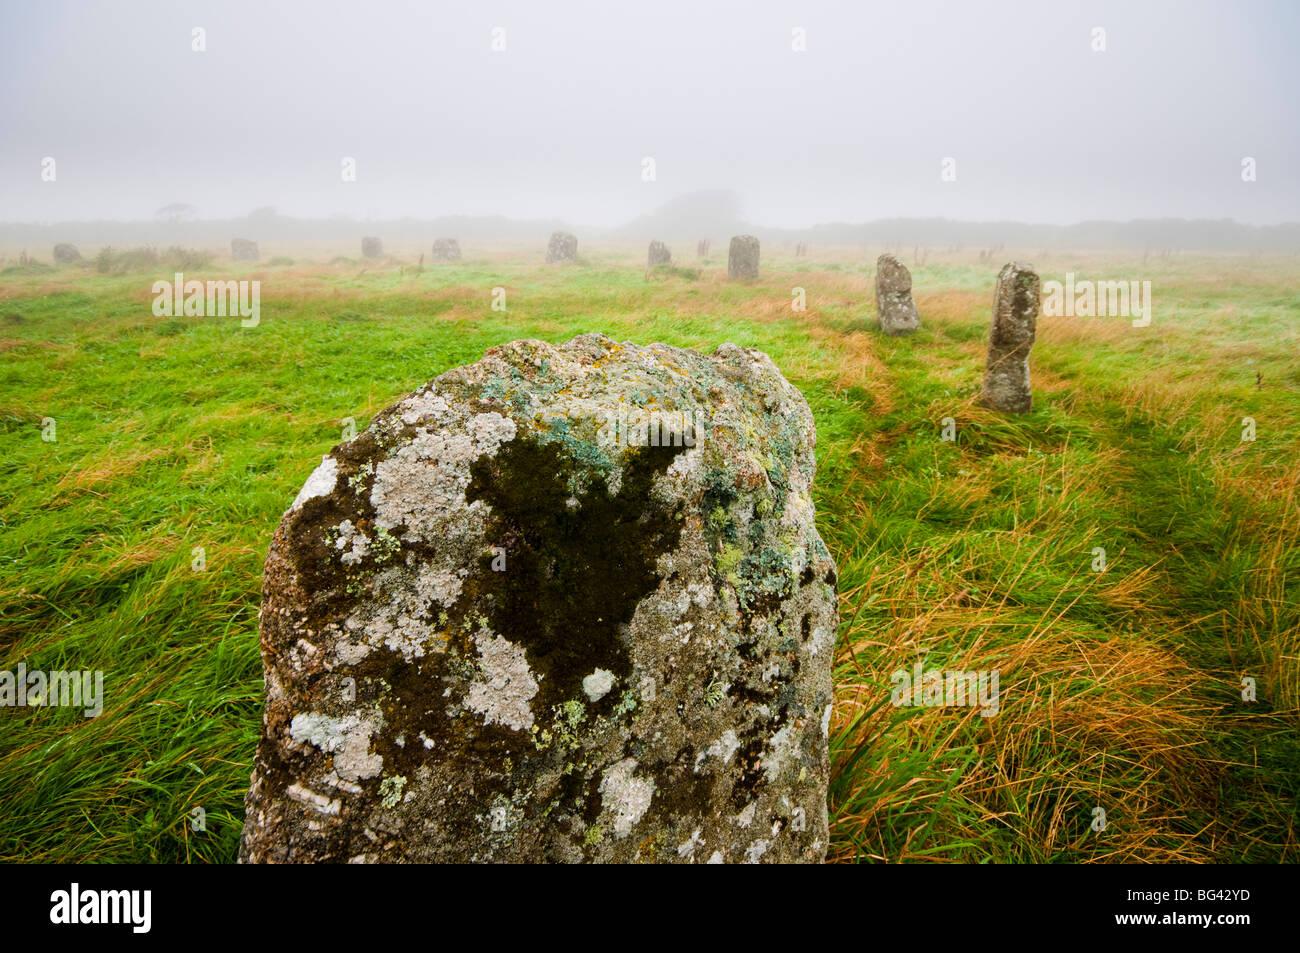 UK, England, Cornwall, Merry Maidens stone circle - Stock Image